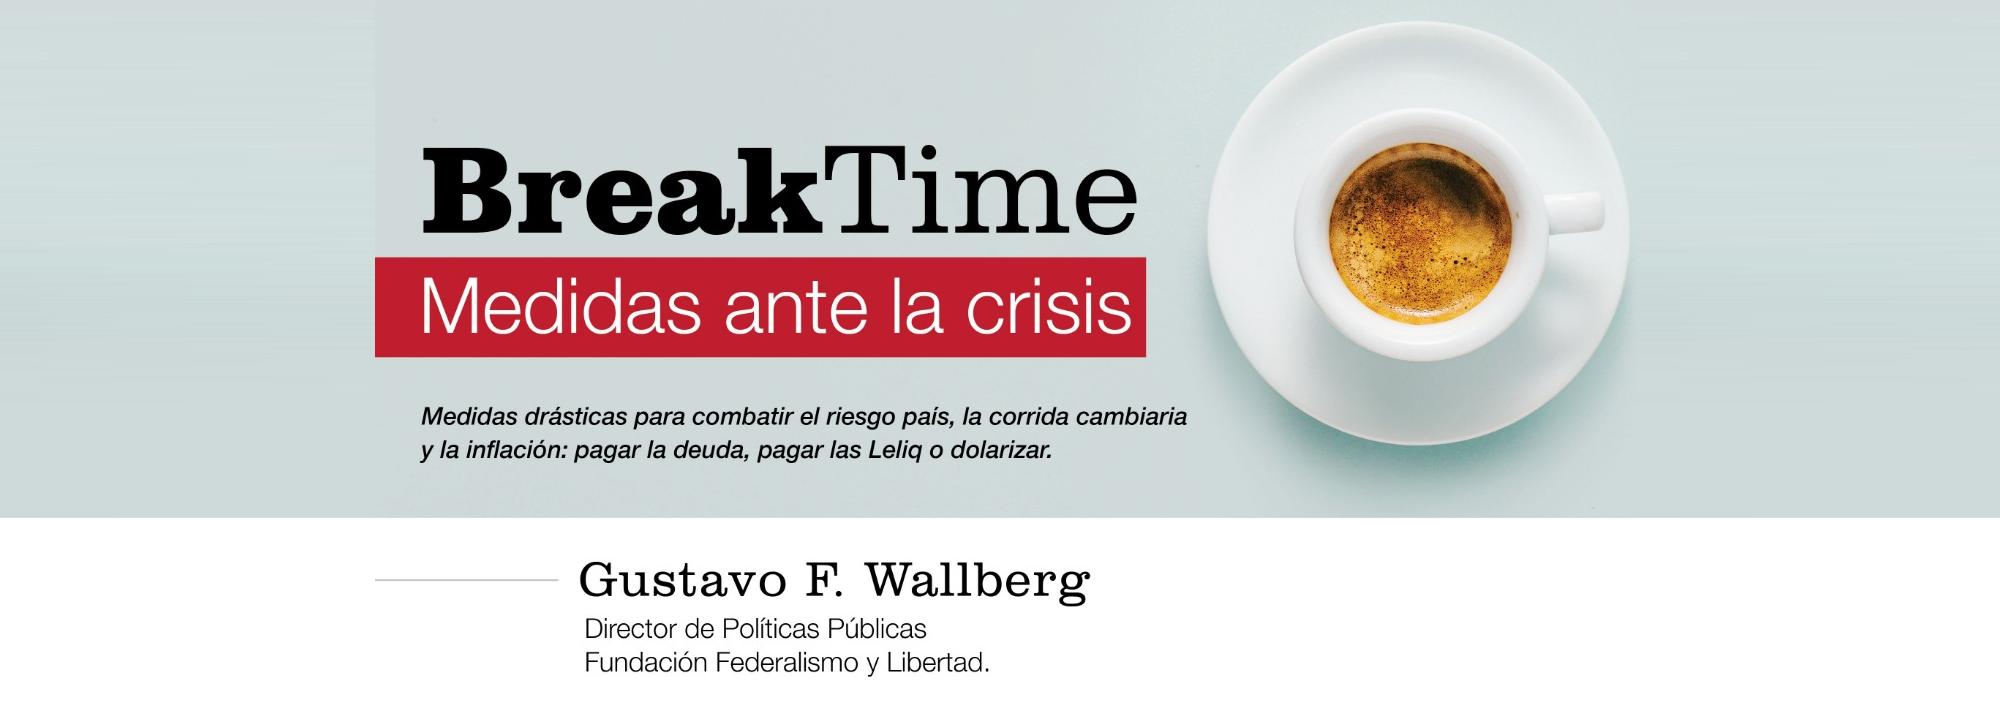 Break Time:  Medidas ante la crisis